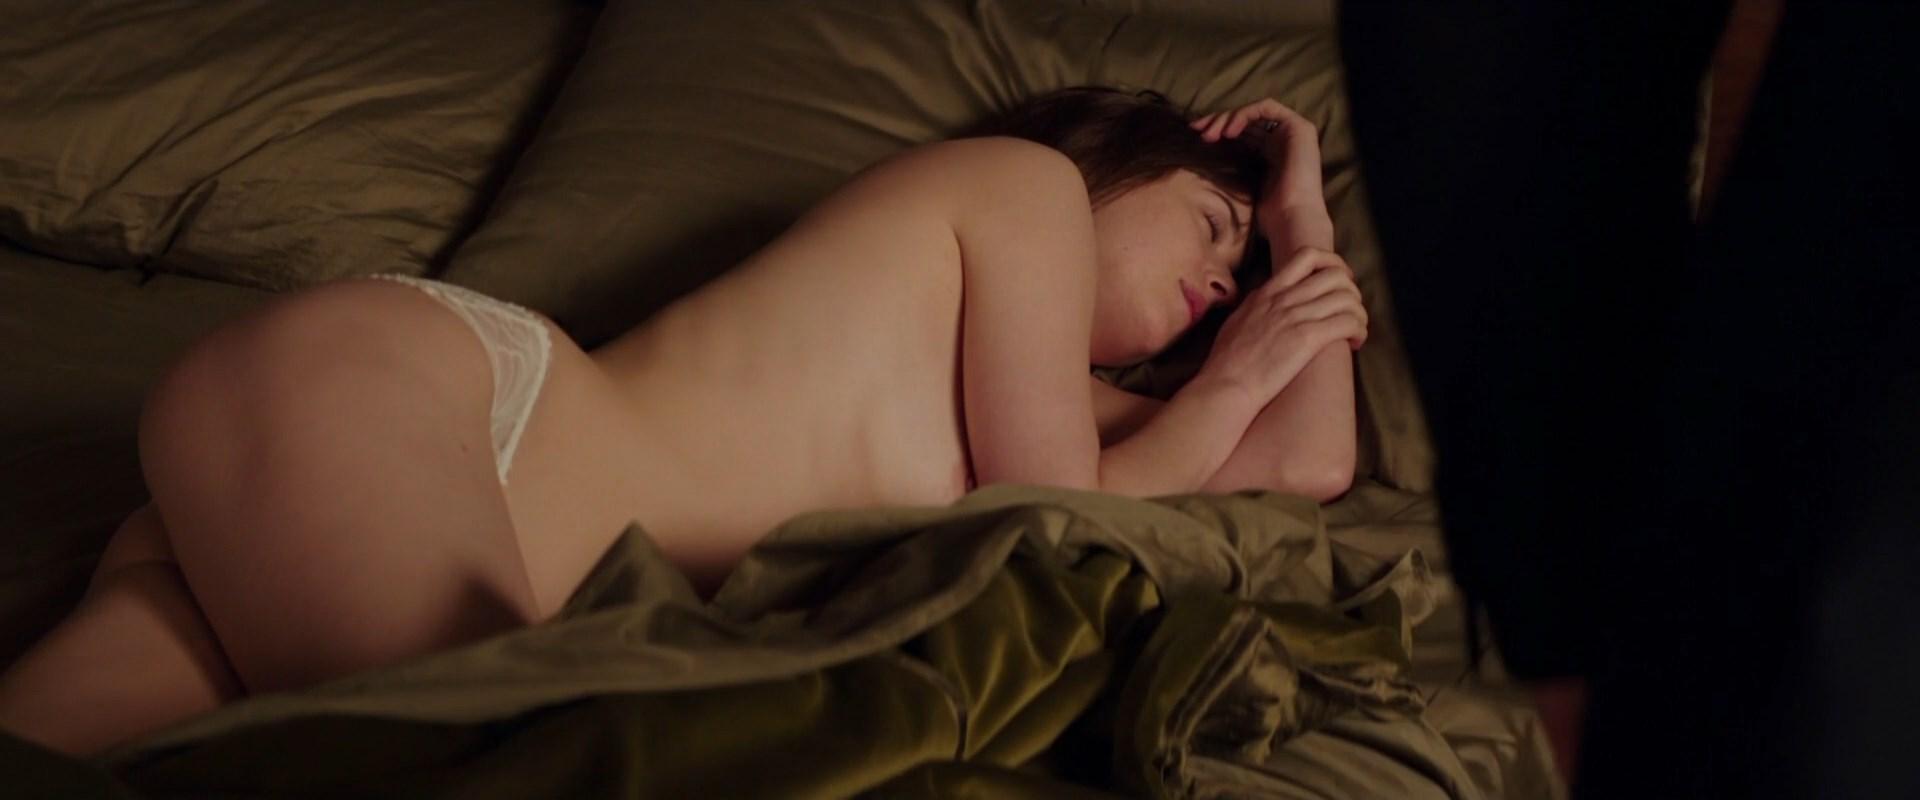 Dakota-Johnson-Fifty-Shades-Freed-2018-HD-1080p.mp4_snapshot_03.50.jpg